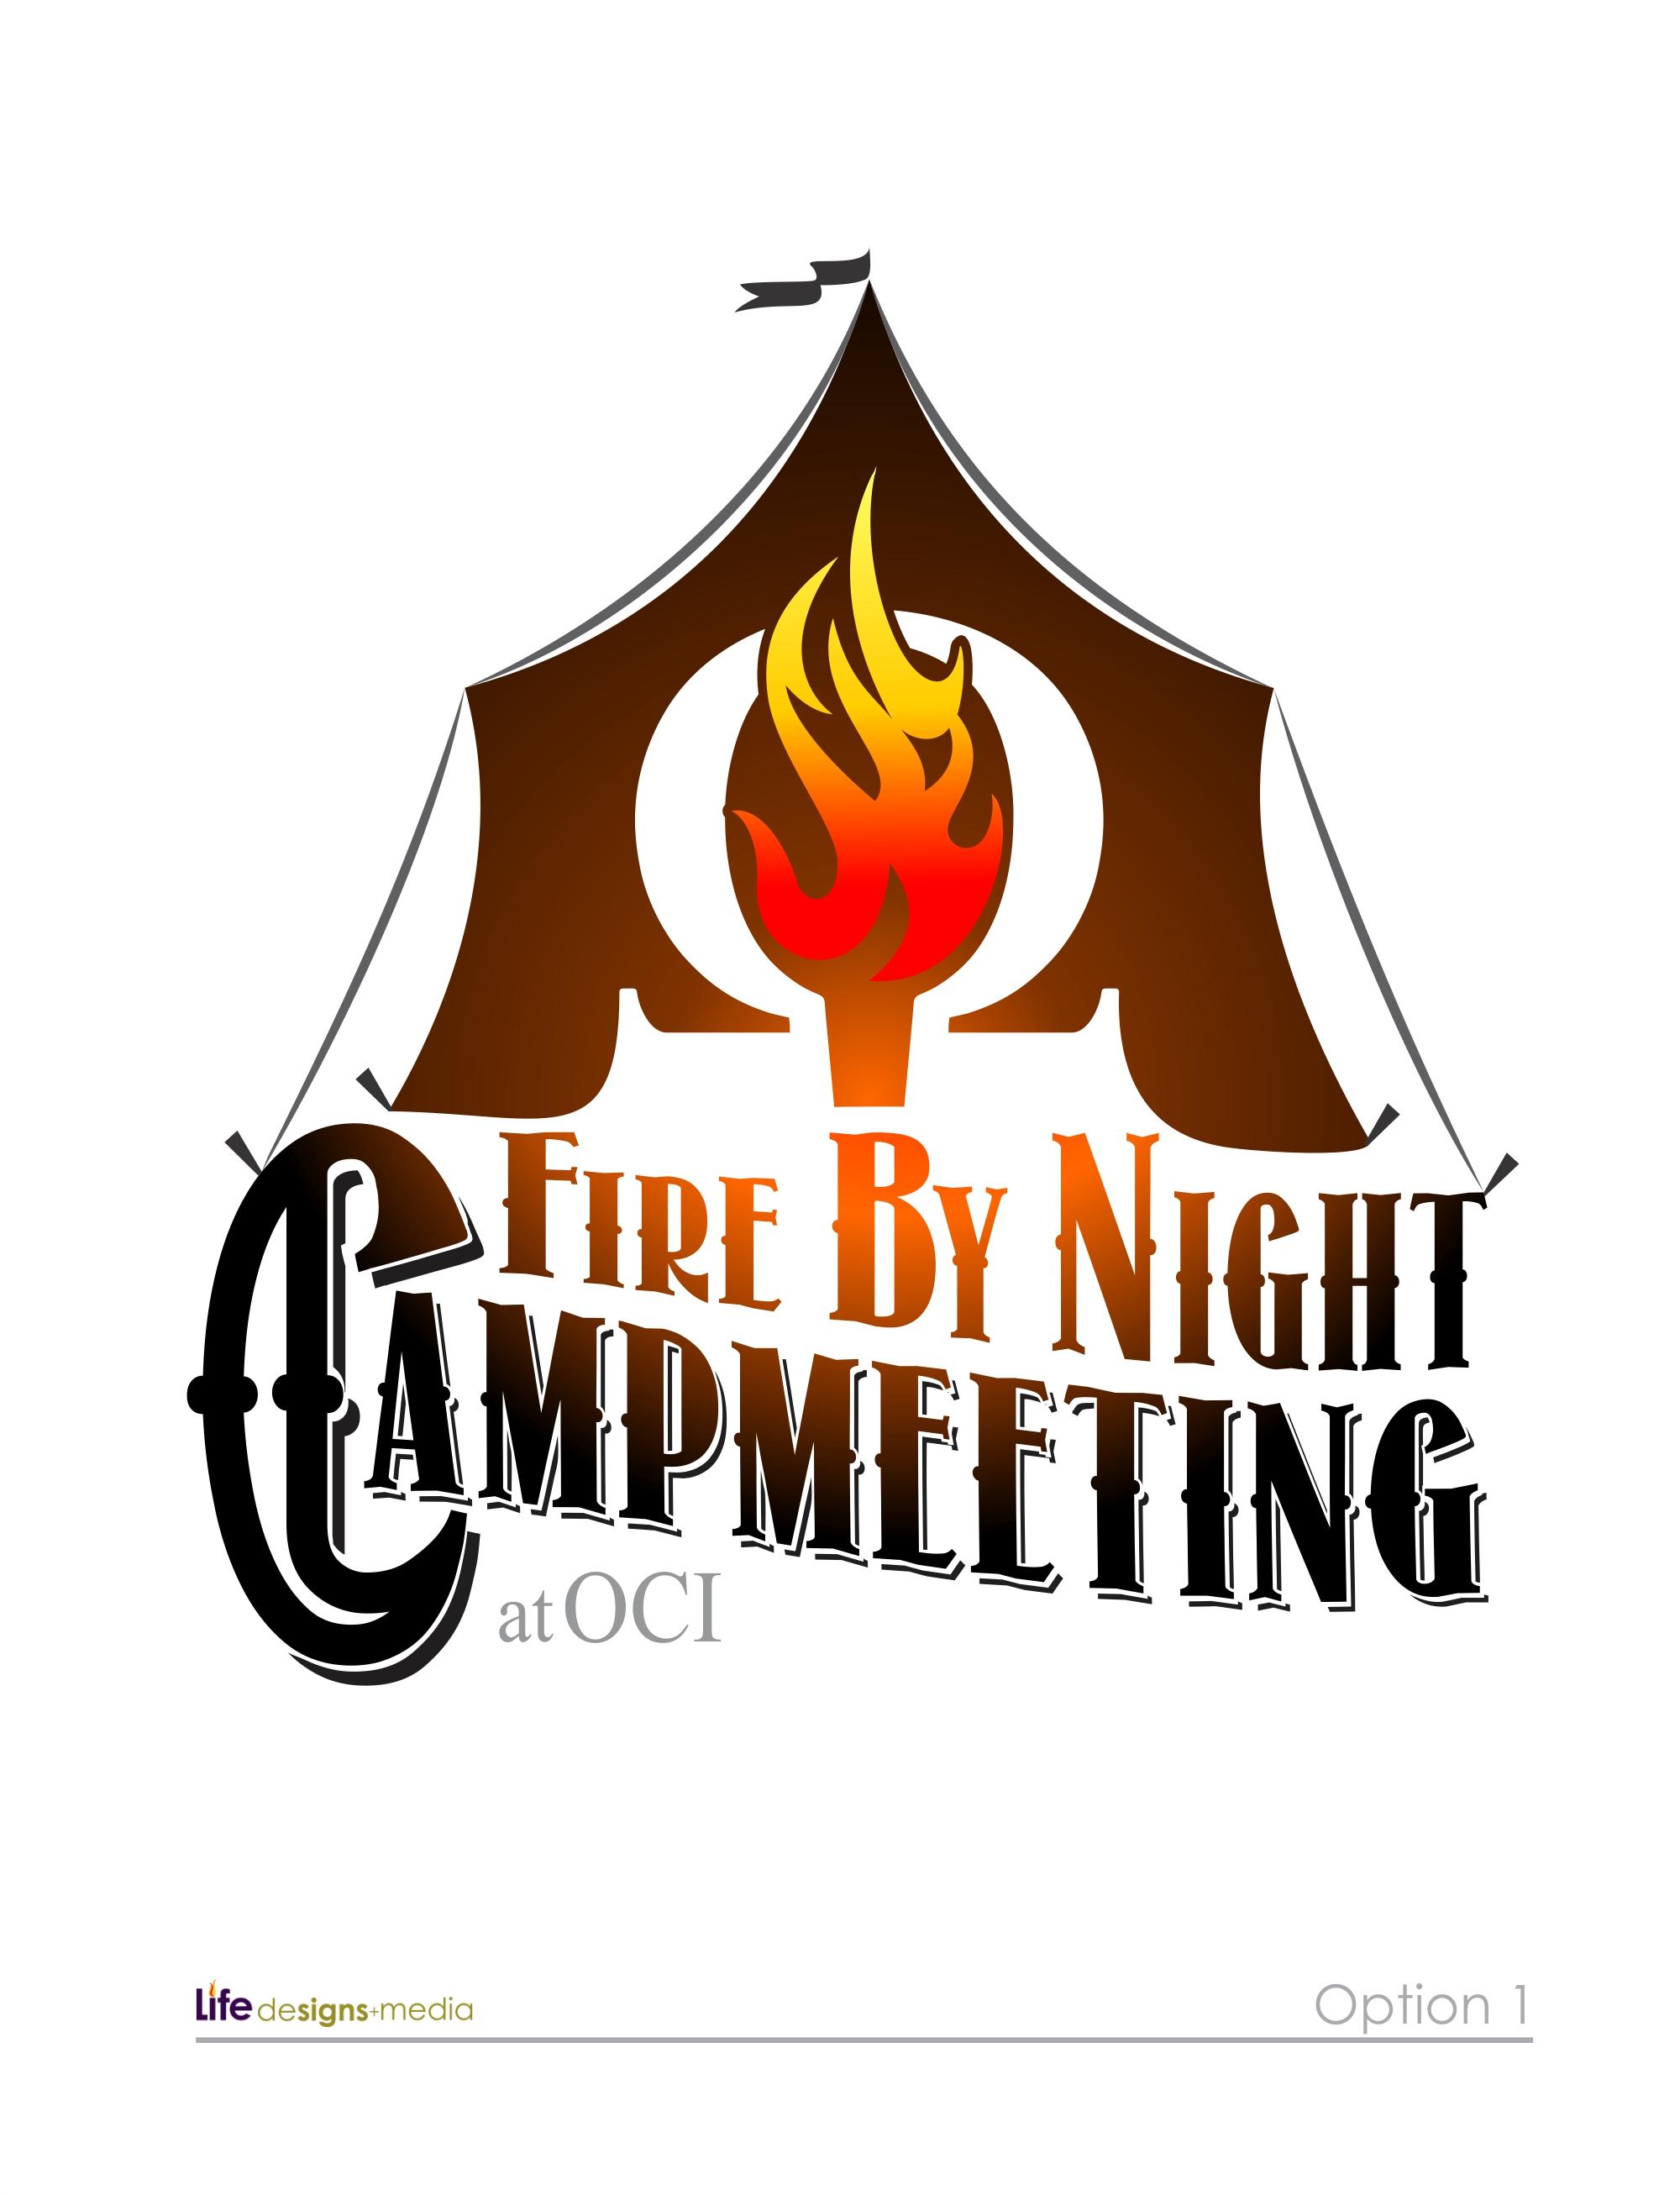 OCI Campmeeting - Option 1